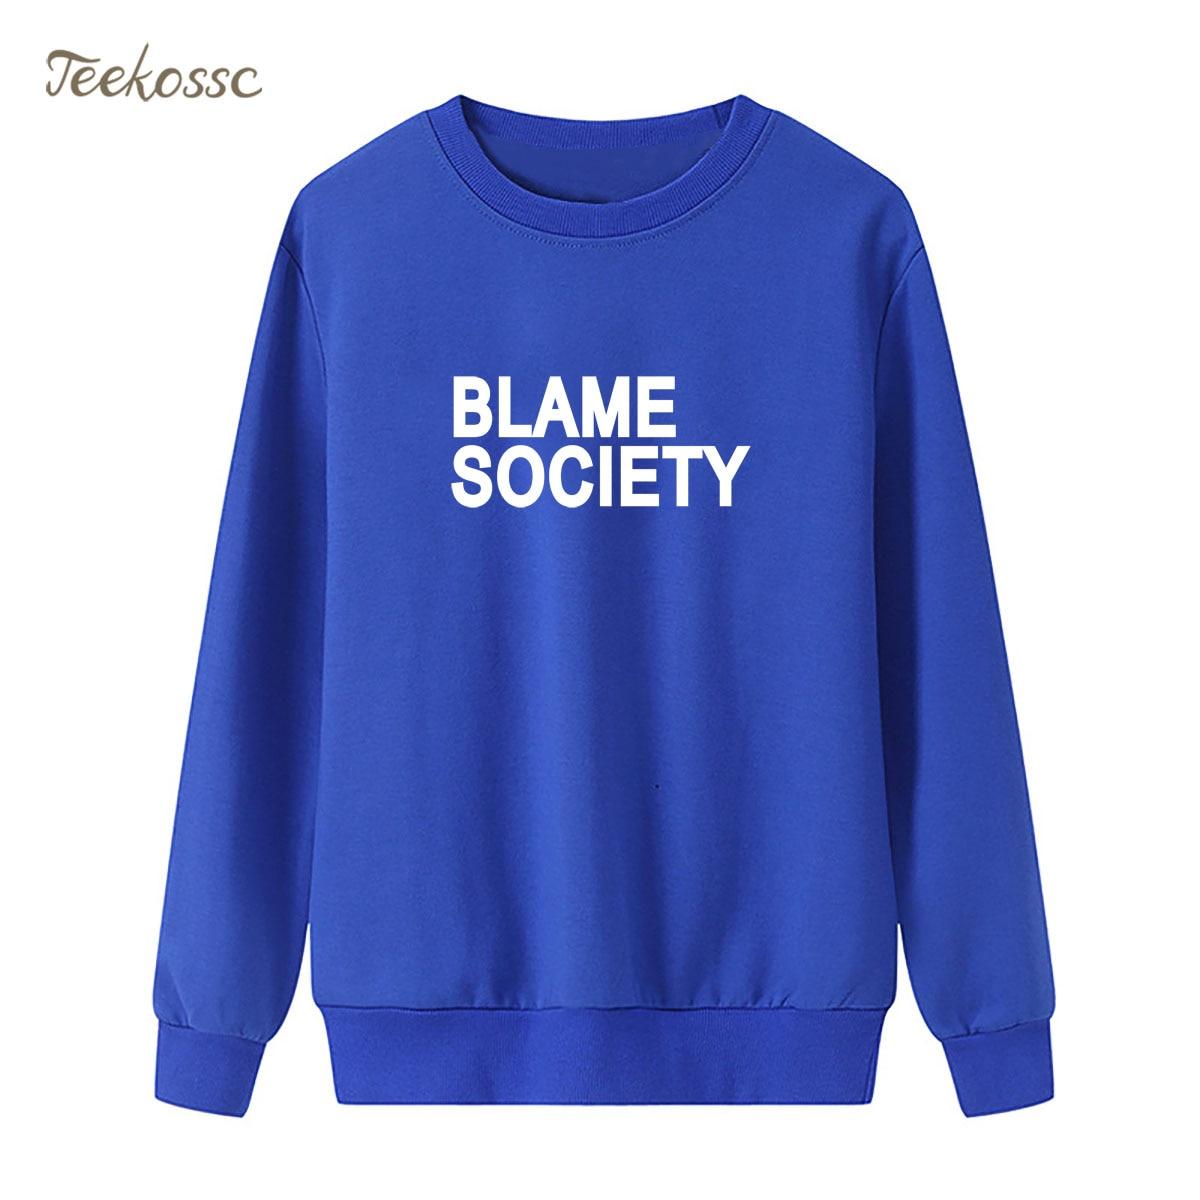 BLAME SOCIETY Sweatshirt Print Punk Rock Hoodie New Fashion Winter Autumn Women Lasdies Pullover Loose Fleece Hip Hop Streetwear